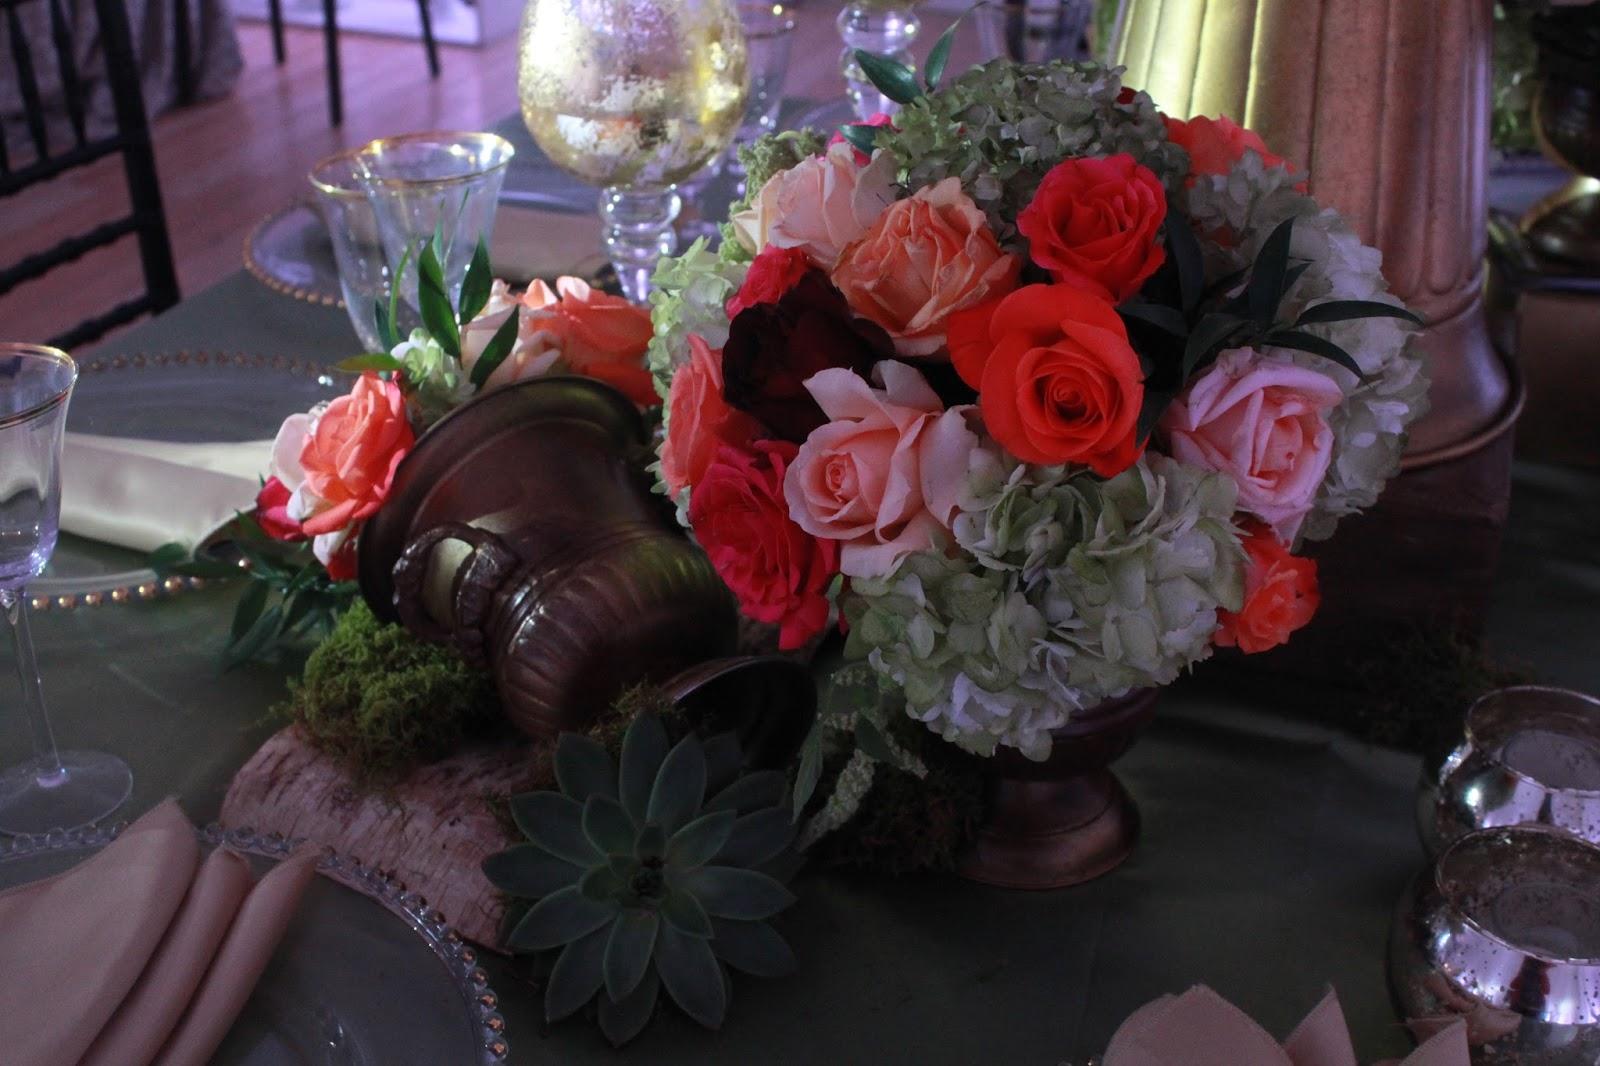 Weddings Florist Washington Dc March 2016